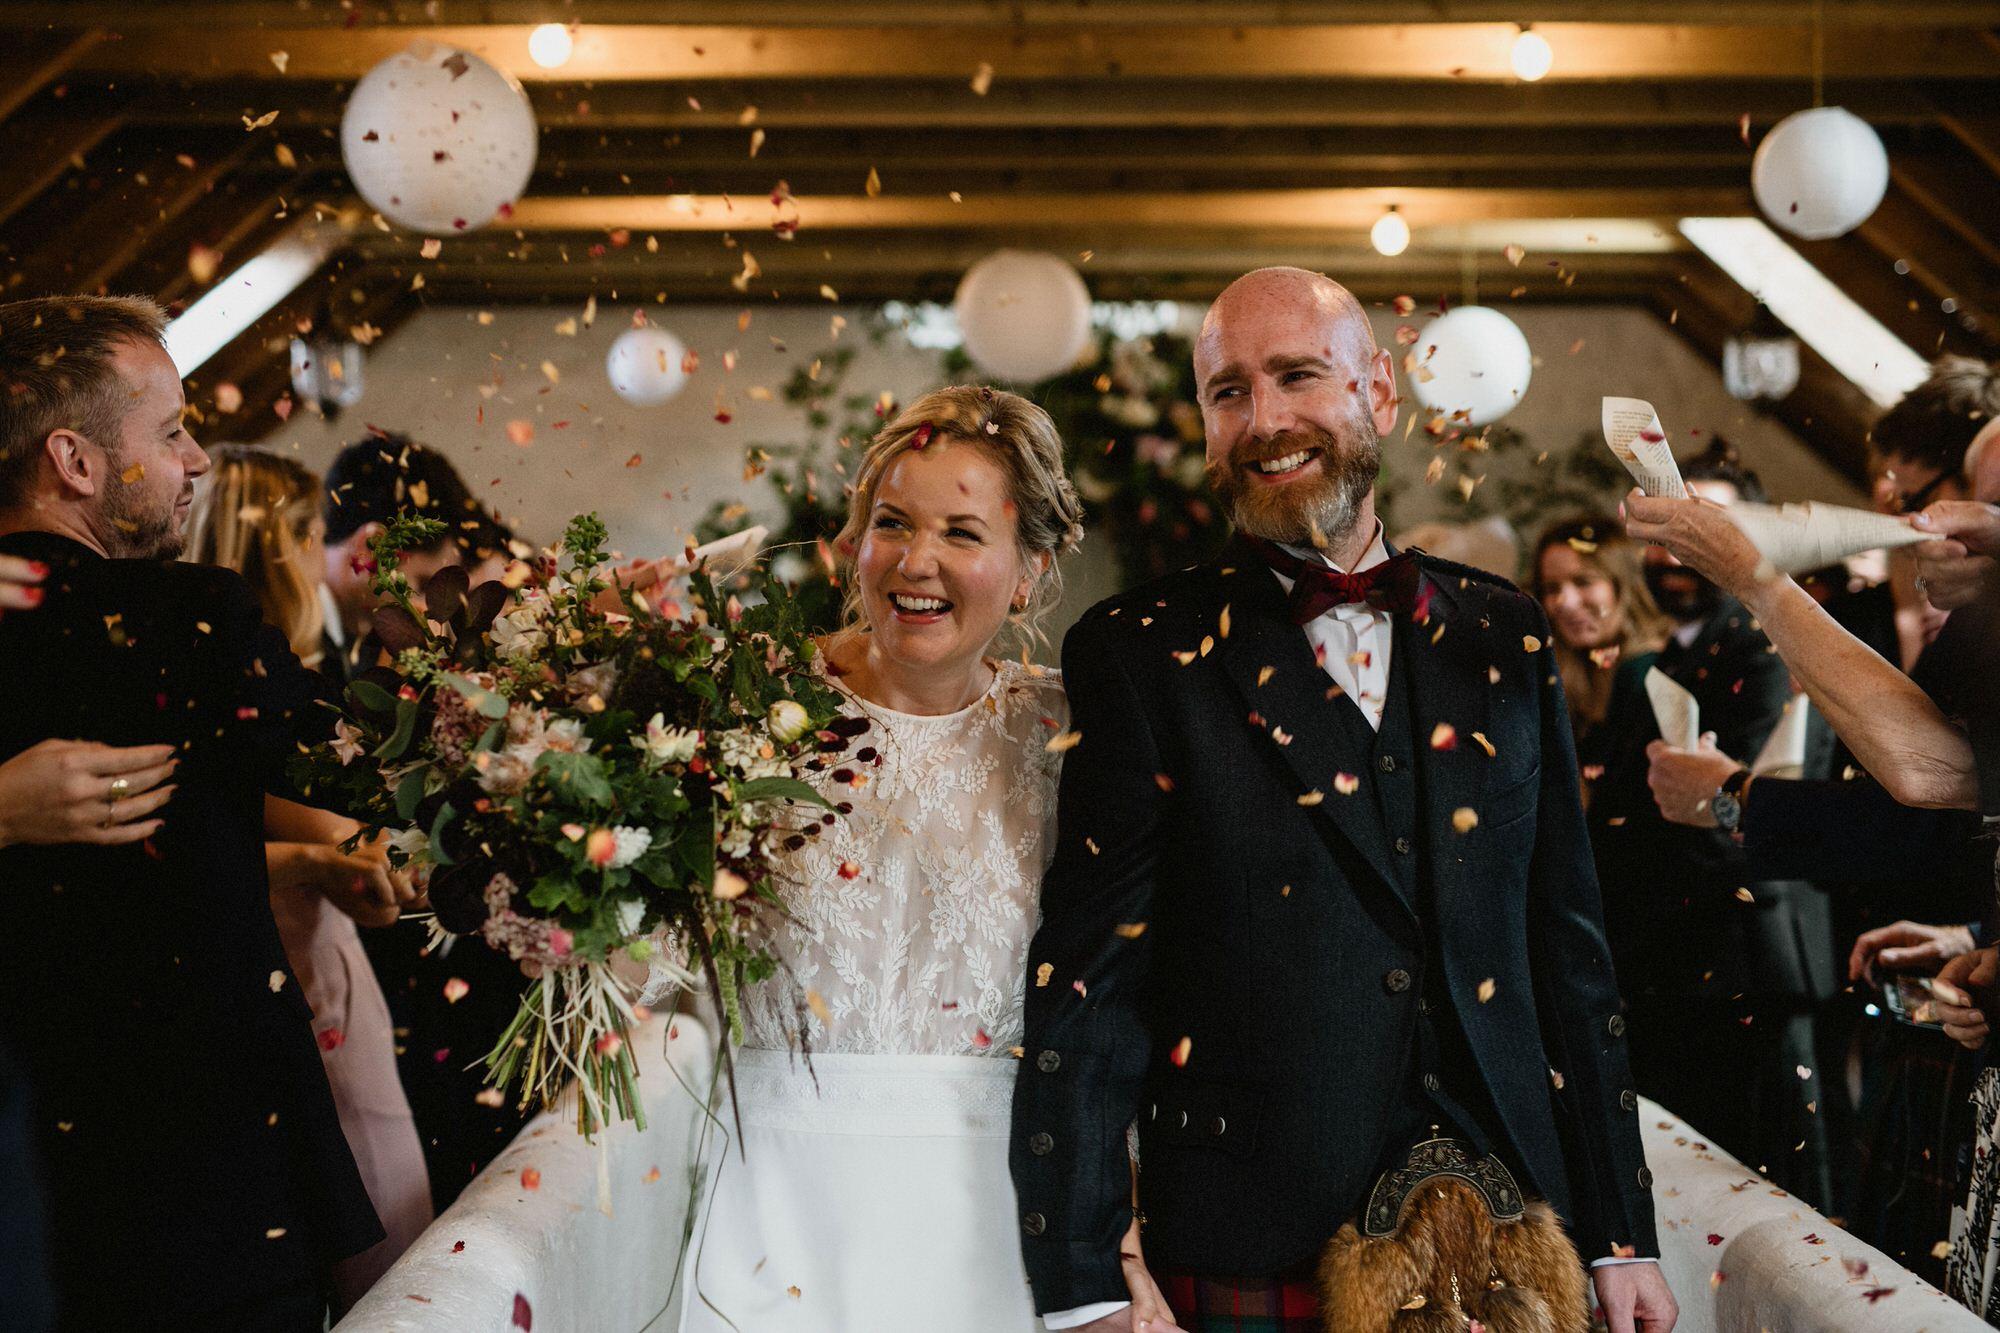 023 TIN SHED KNOCKRAICH WEDDING AUTUMN ZOE ALEXANDRA PHOTOGRAPHY